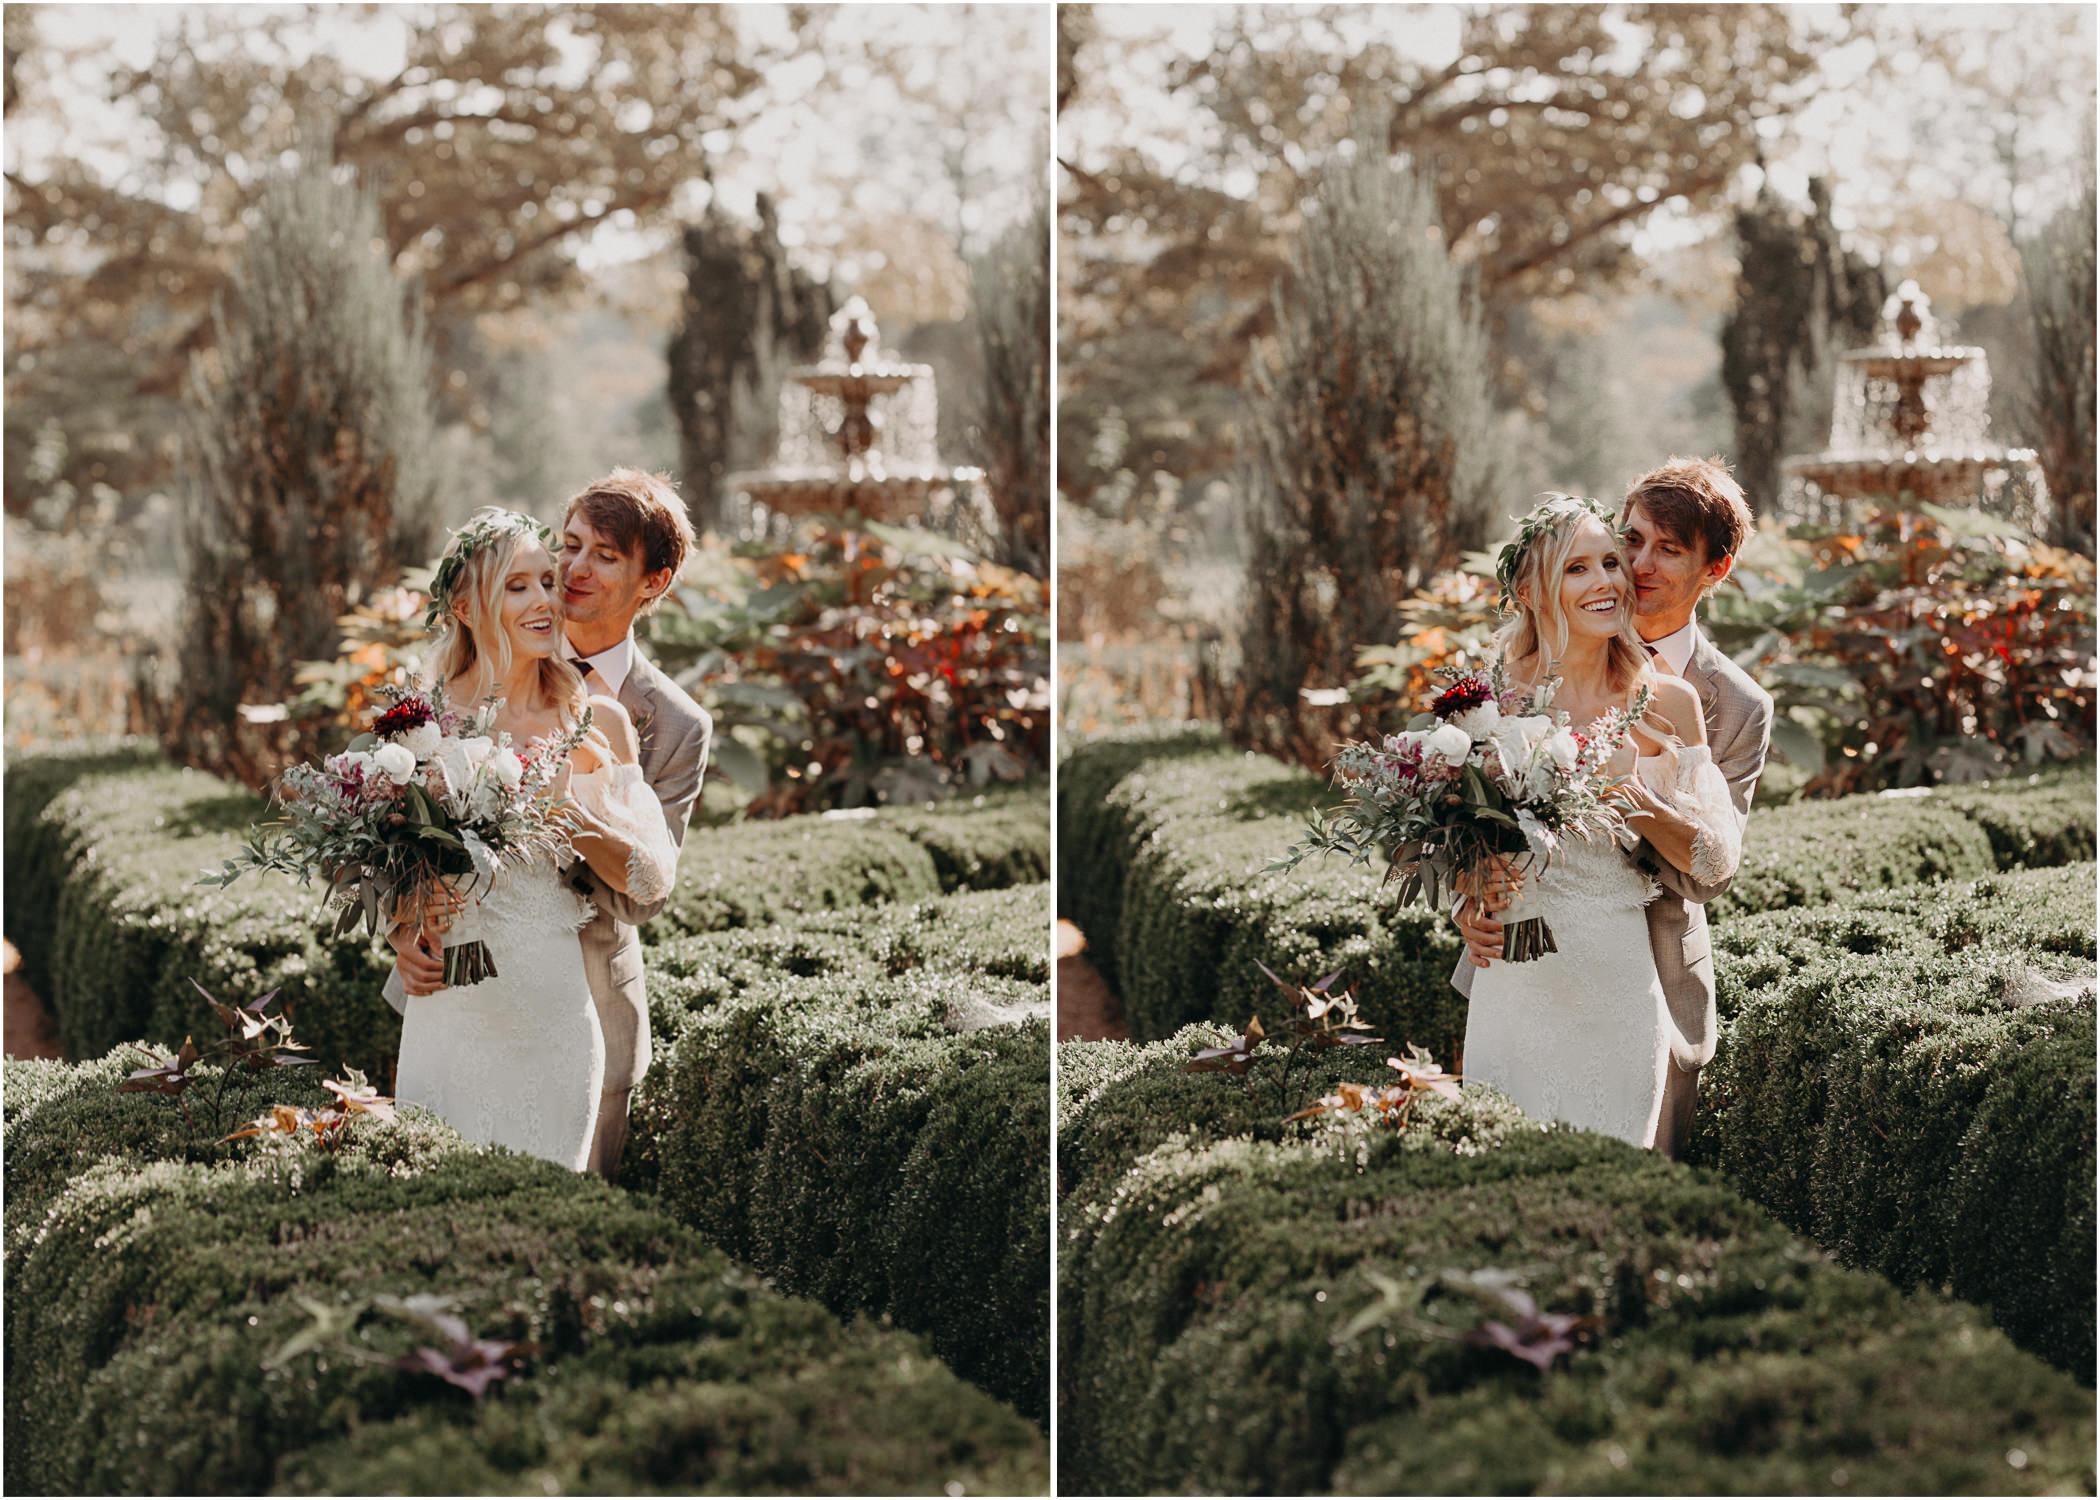 27 - Barnsley Gardens Wedding - Bride portraits - First Look .jpg